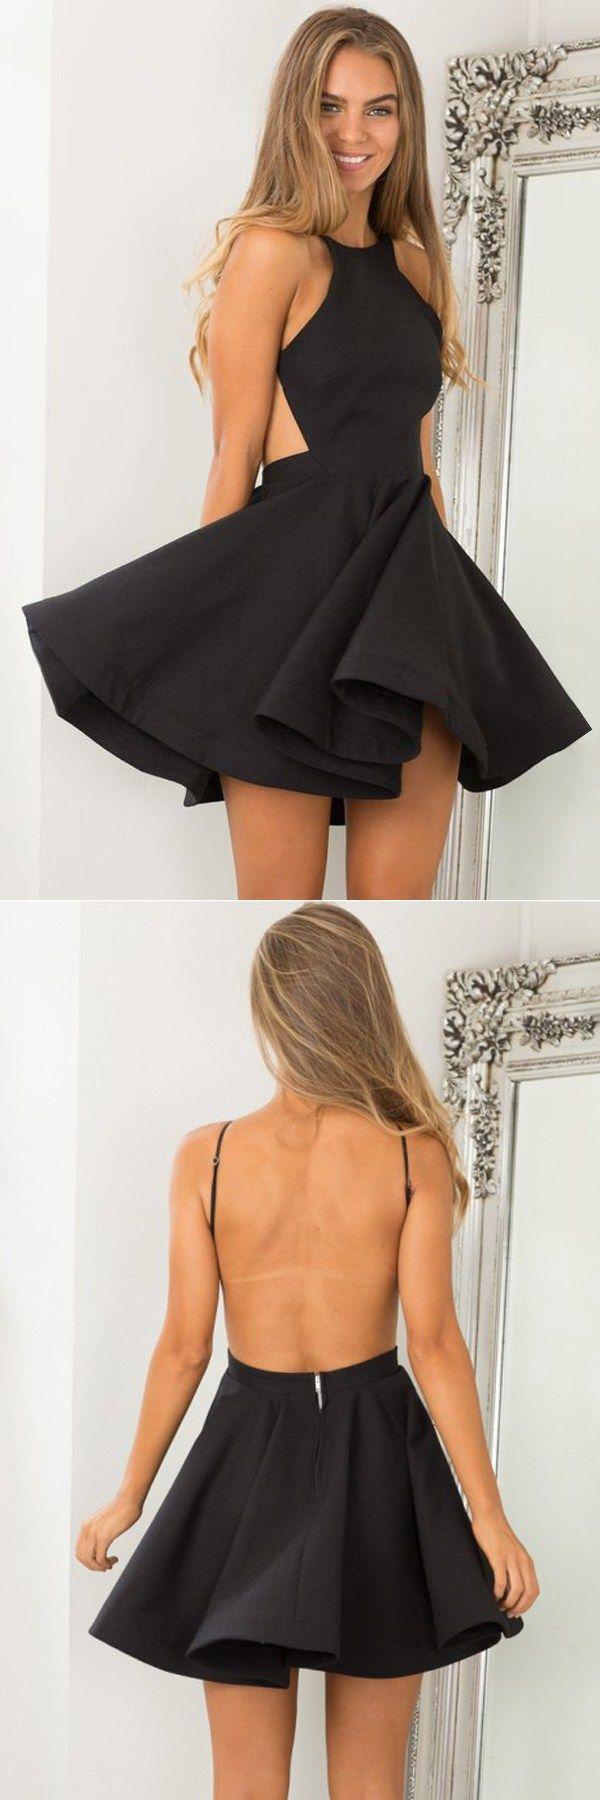 Aline halter backless short black satin homecoming dress semi